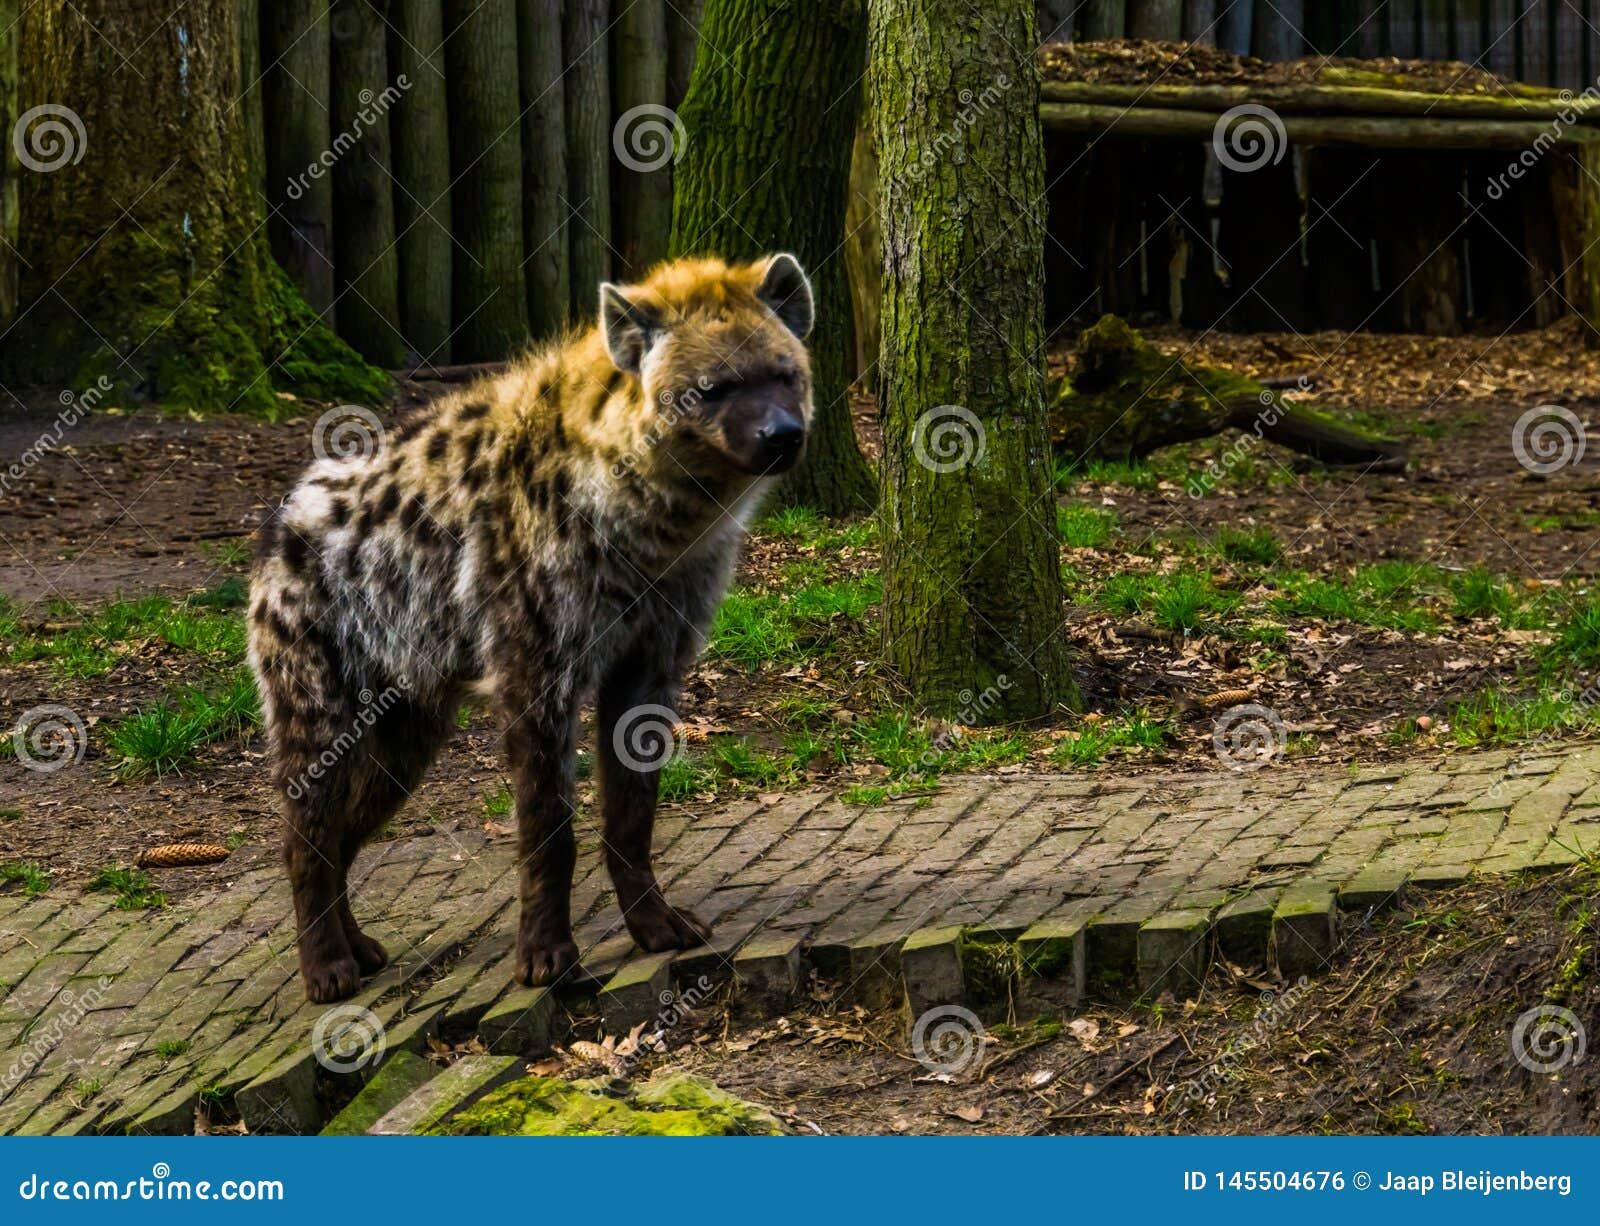 Closeup av en prickig hyena, k?tt?tande d?ggdjur fr?n Afrika, popul?ra zoodjur